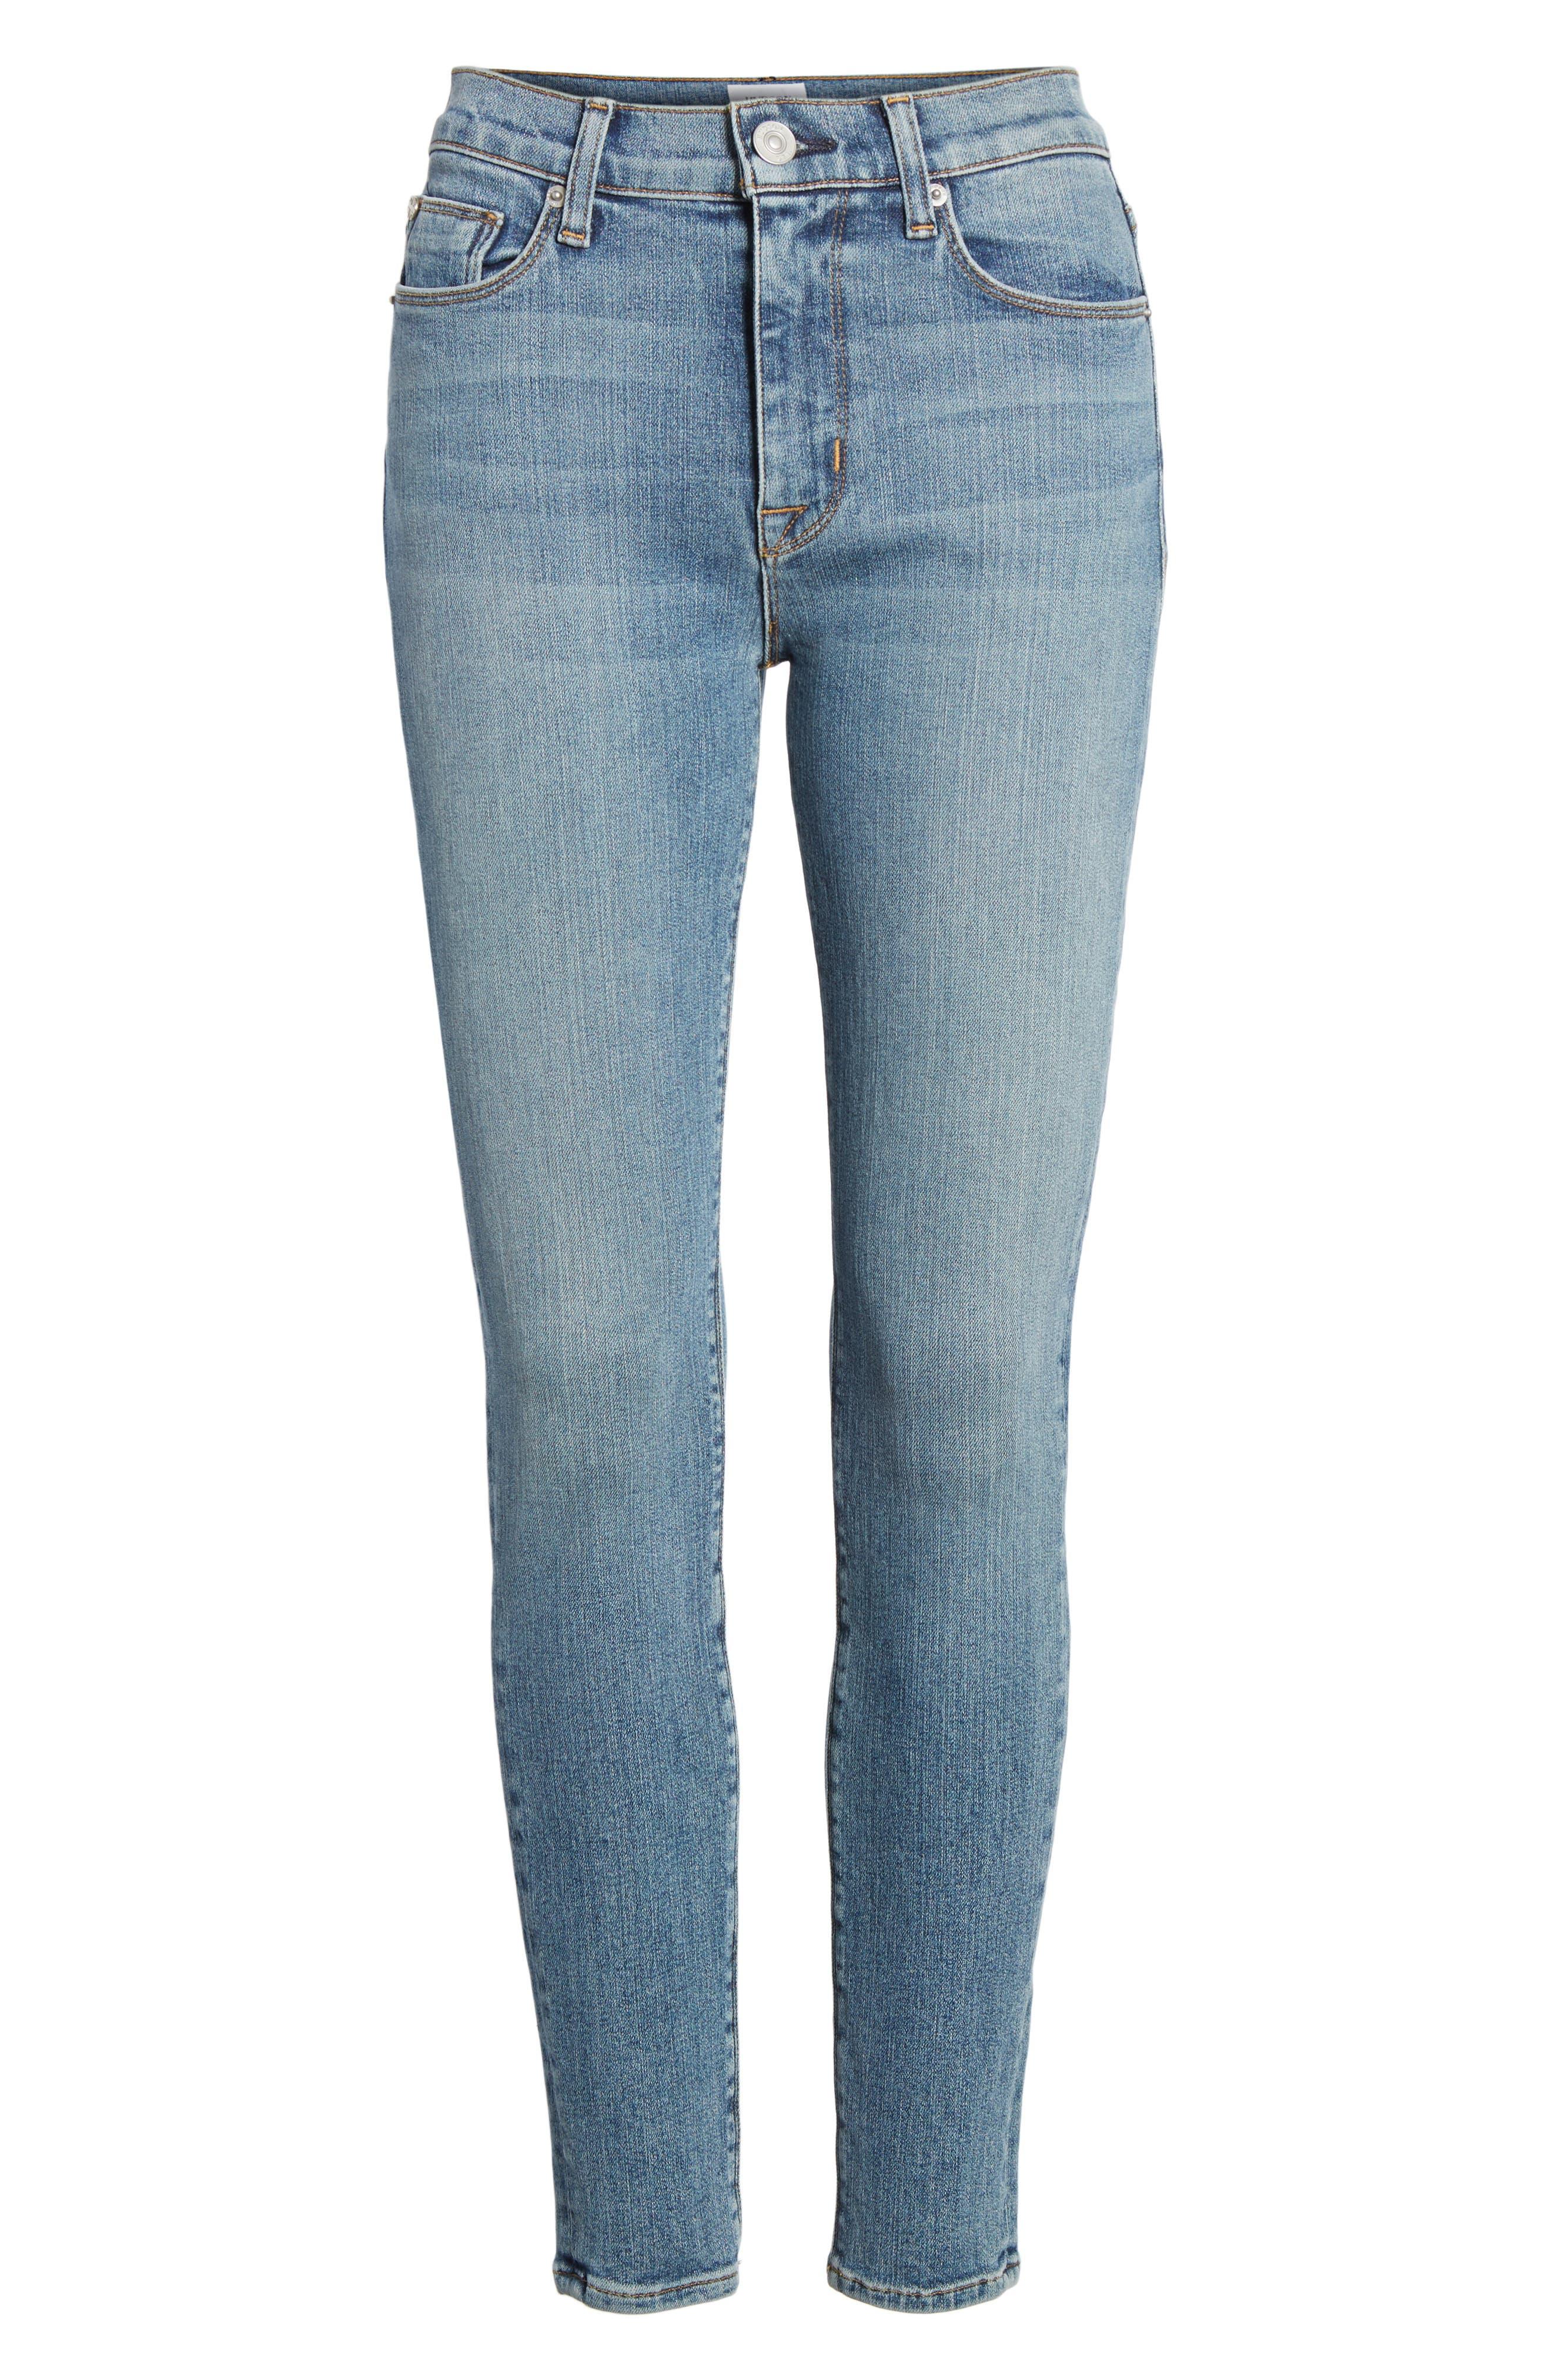 Barbara High Waist Ankle Super Skinny Jeans,                             Alternate thumbnail 12, color,